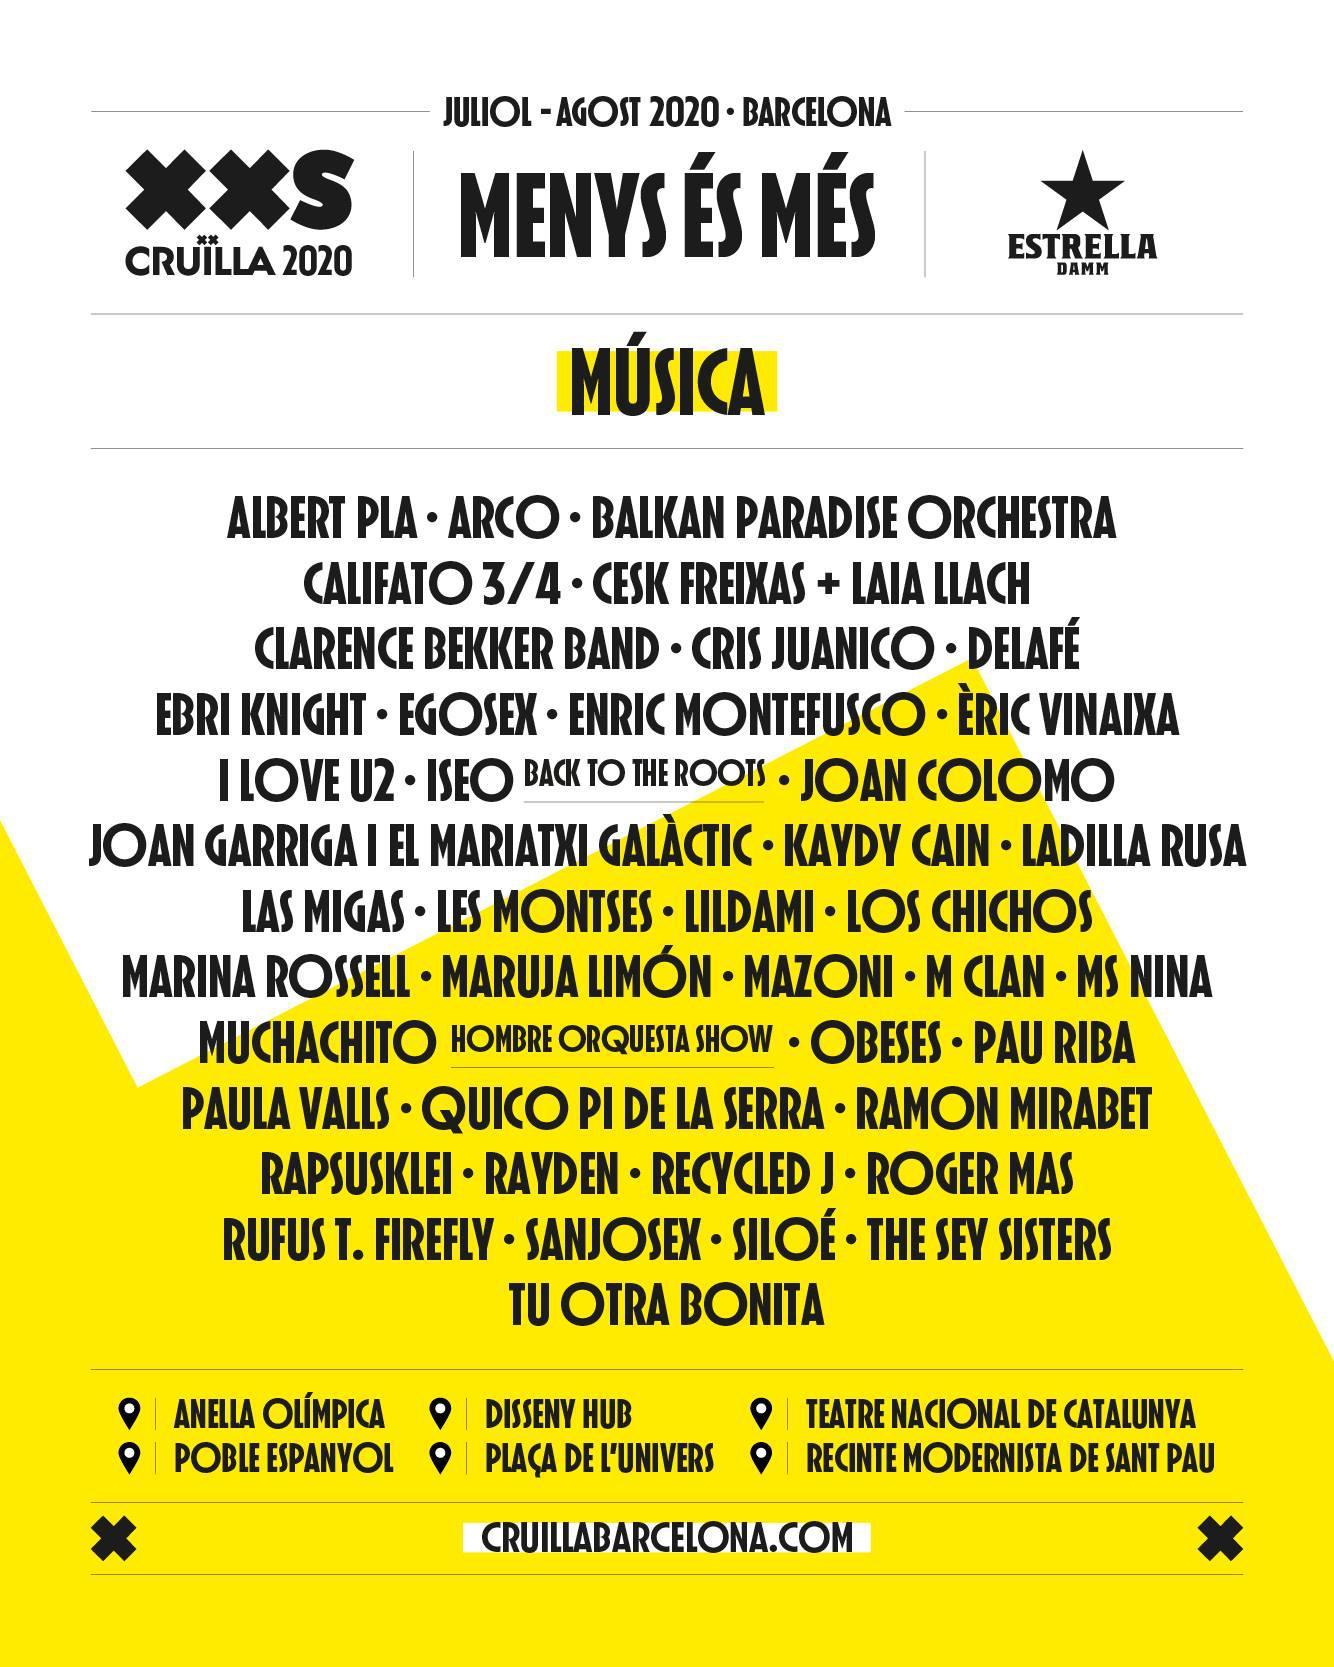 Cruïlla XXS - festivales.wiki